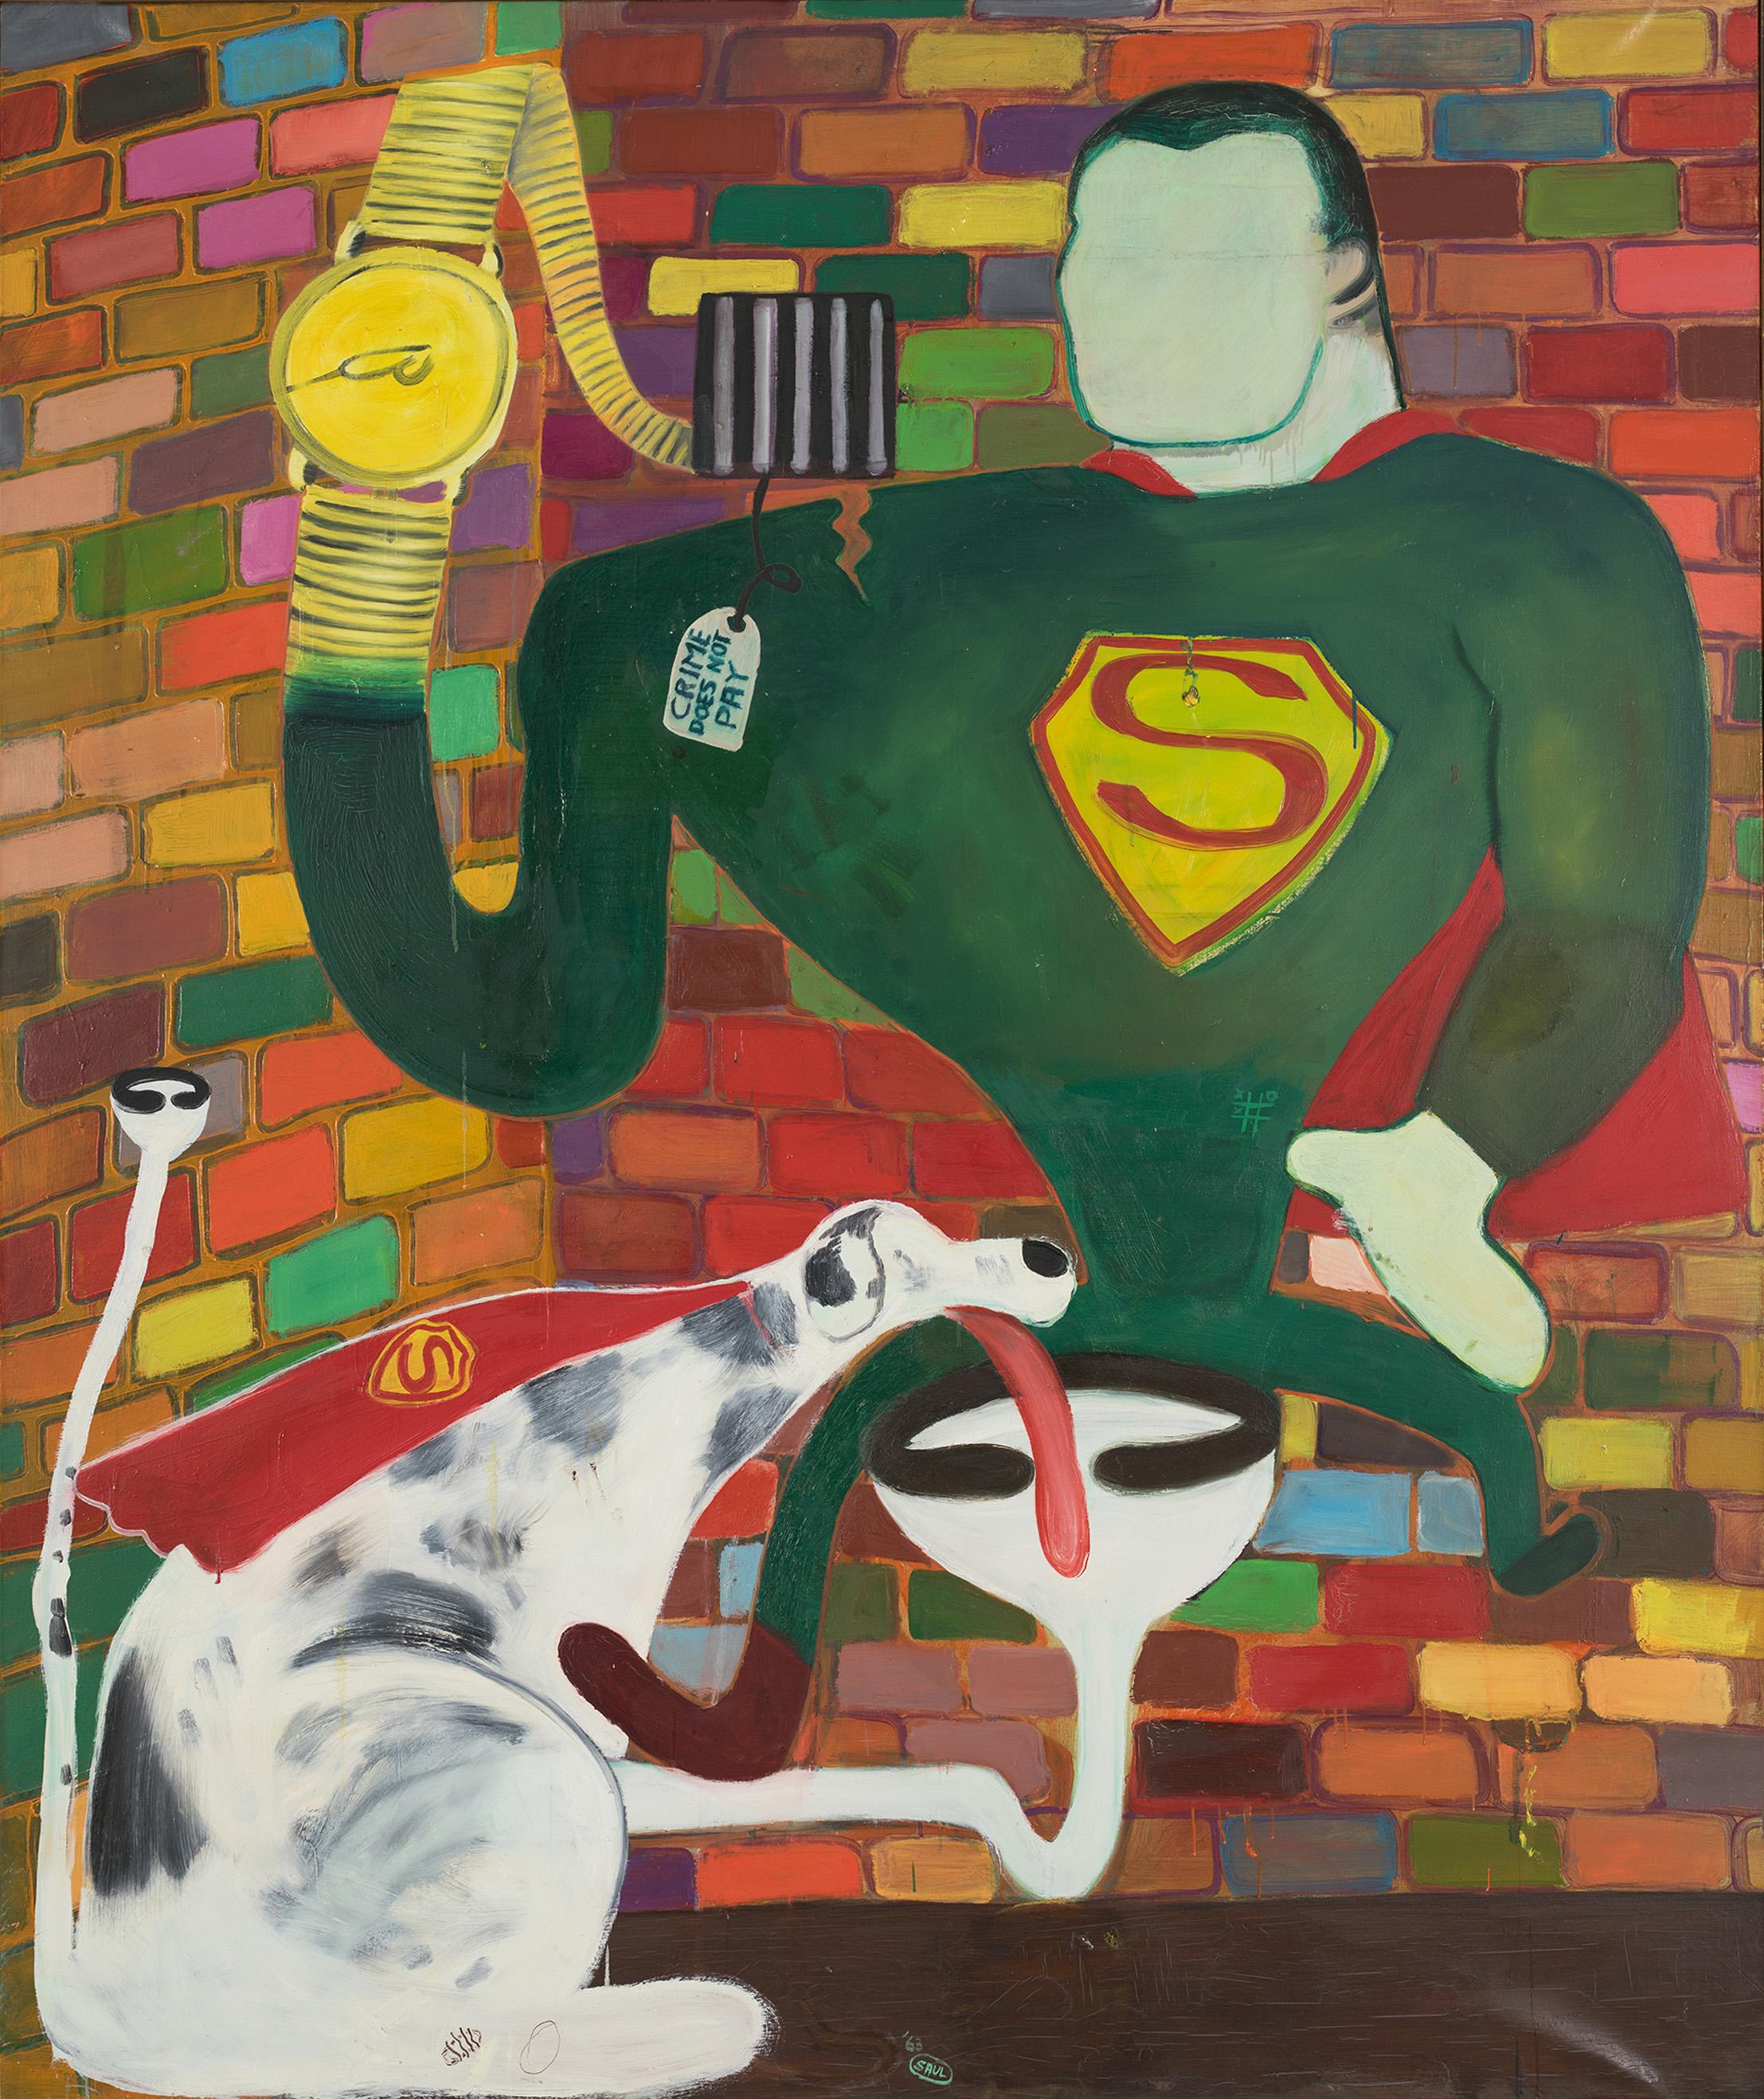 Superman and Superdog in Jail, 1963, Öl auf Leinwand